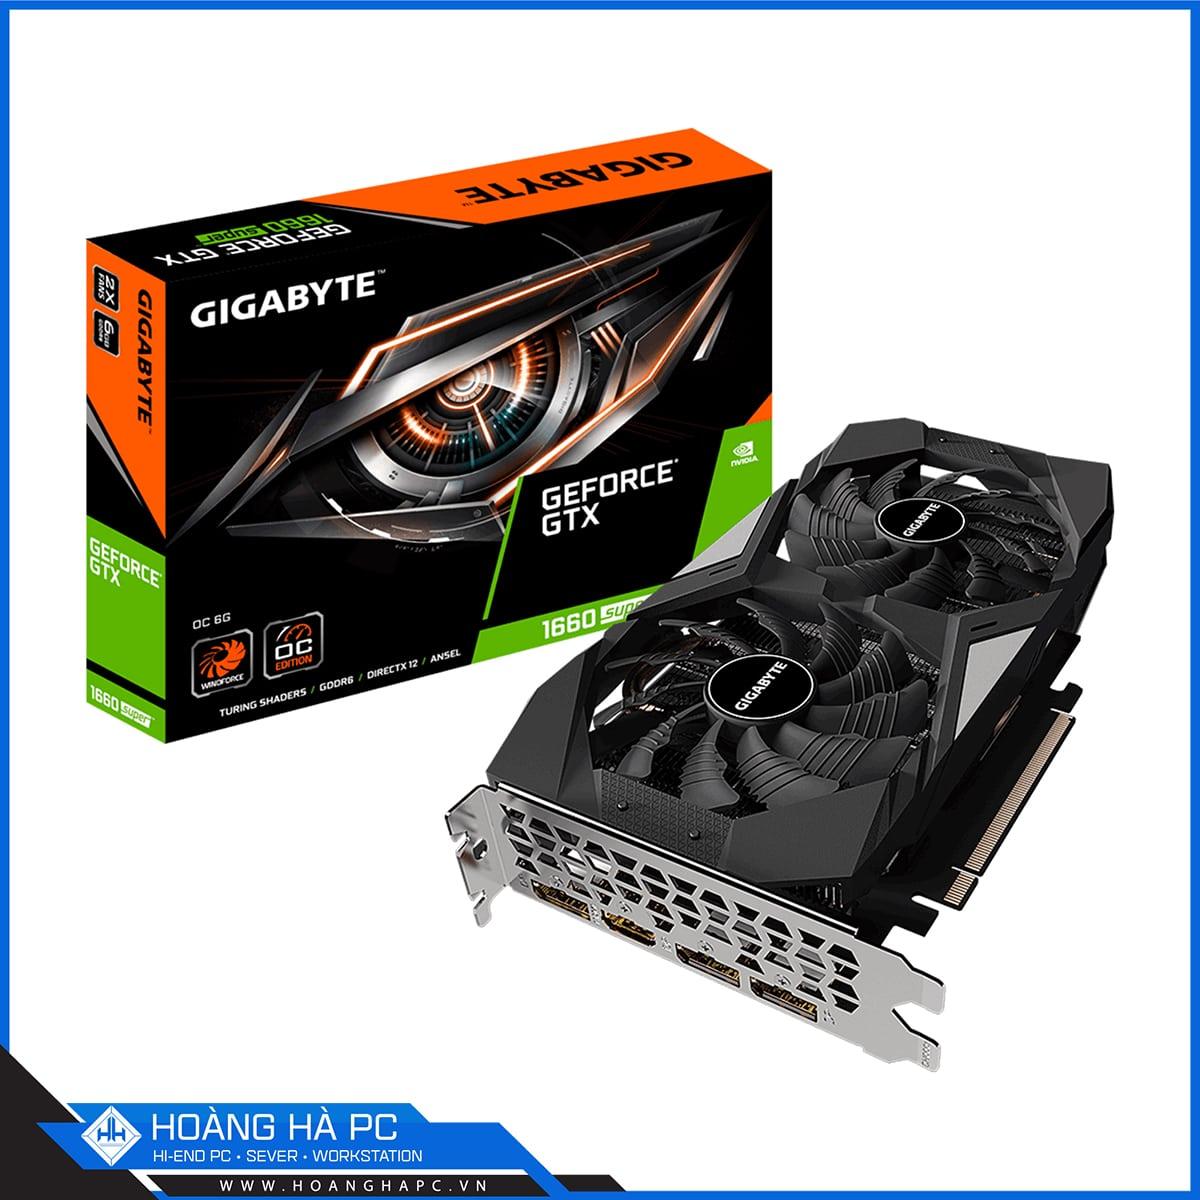 Gigabyte GeForce GTX 1660 Super OC 6GB